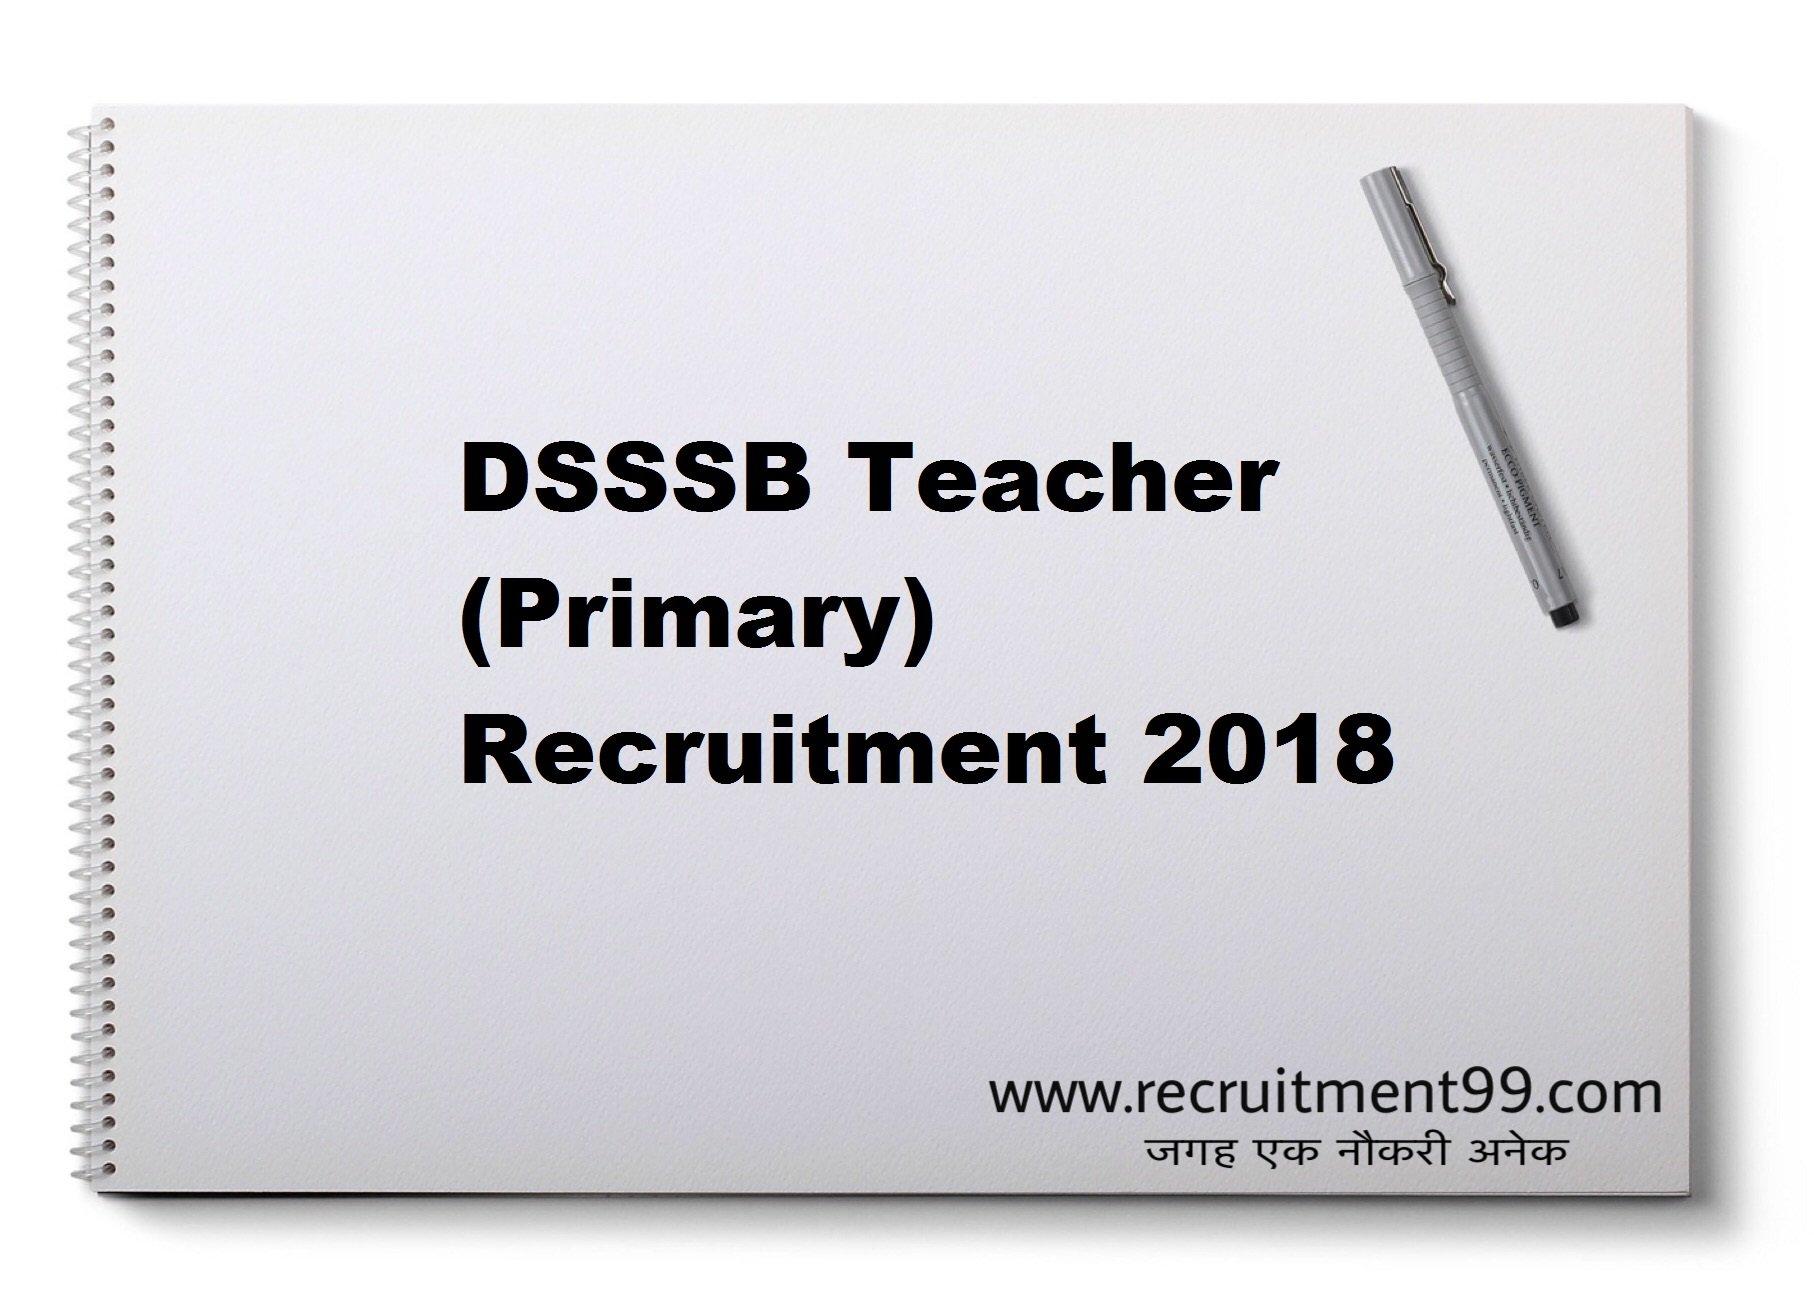 DSSSB Teacher (Primary) Recruitment Admit Card Result 2018